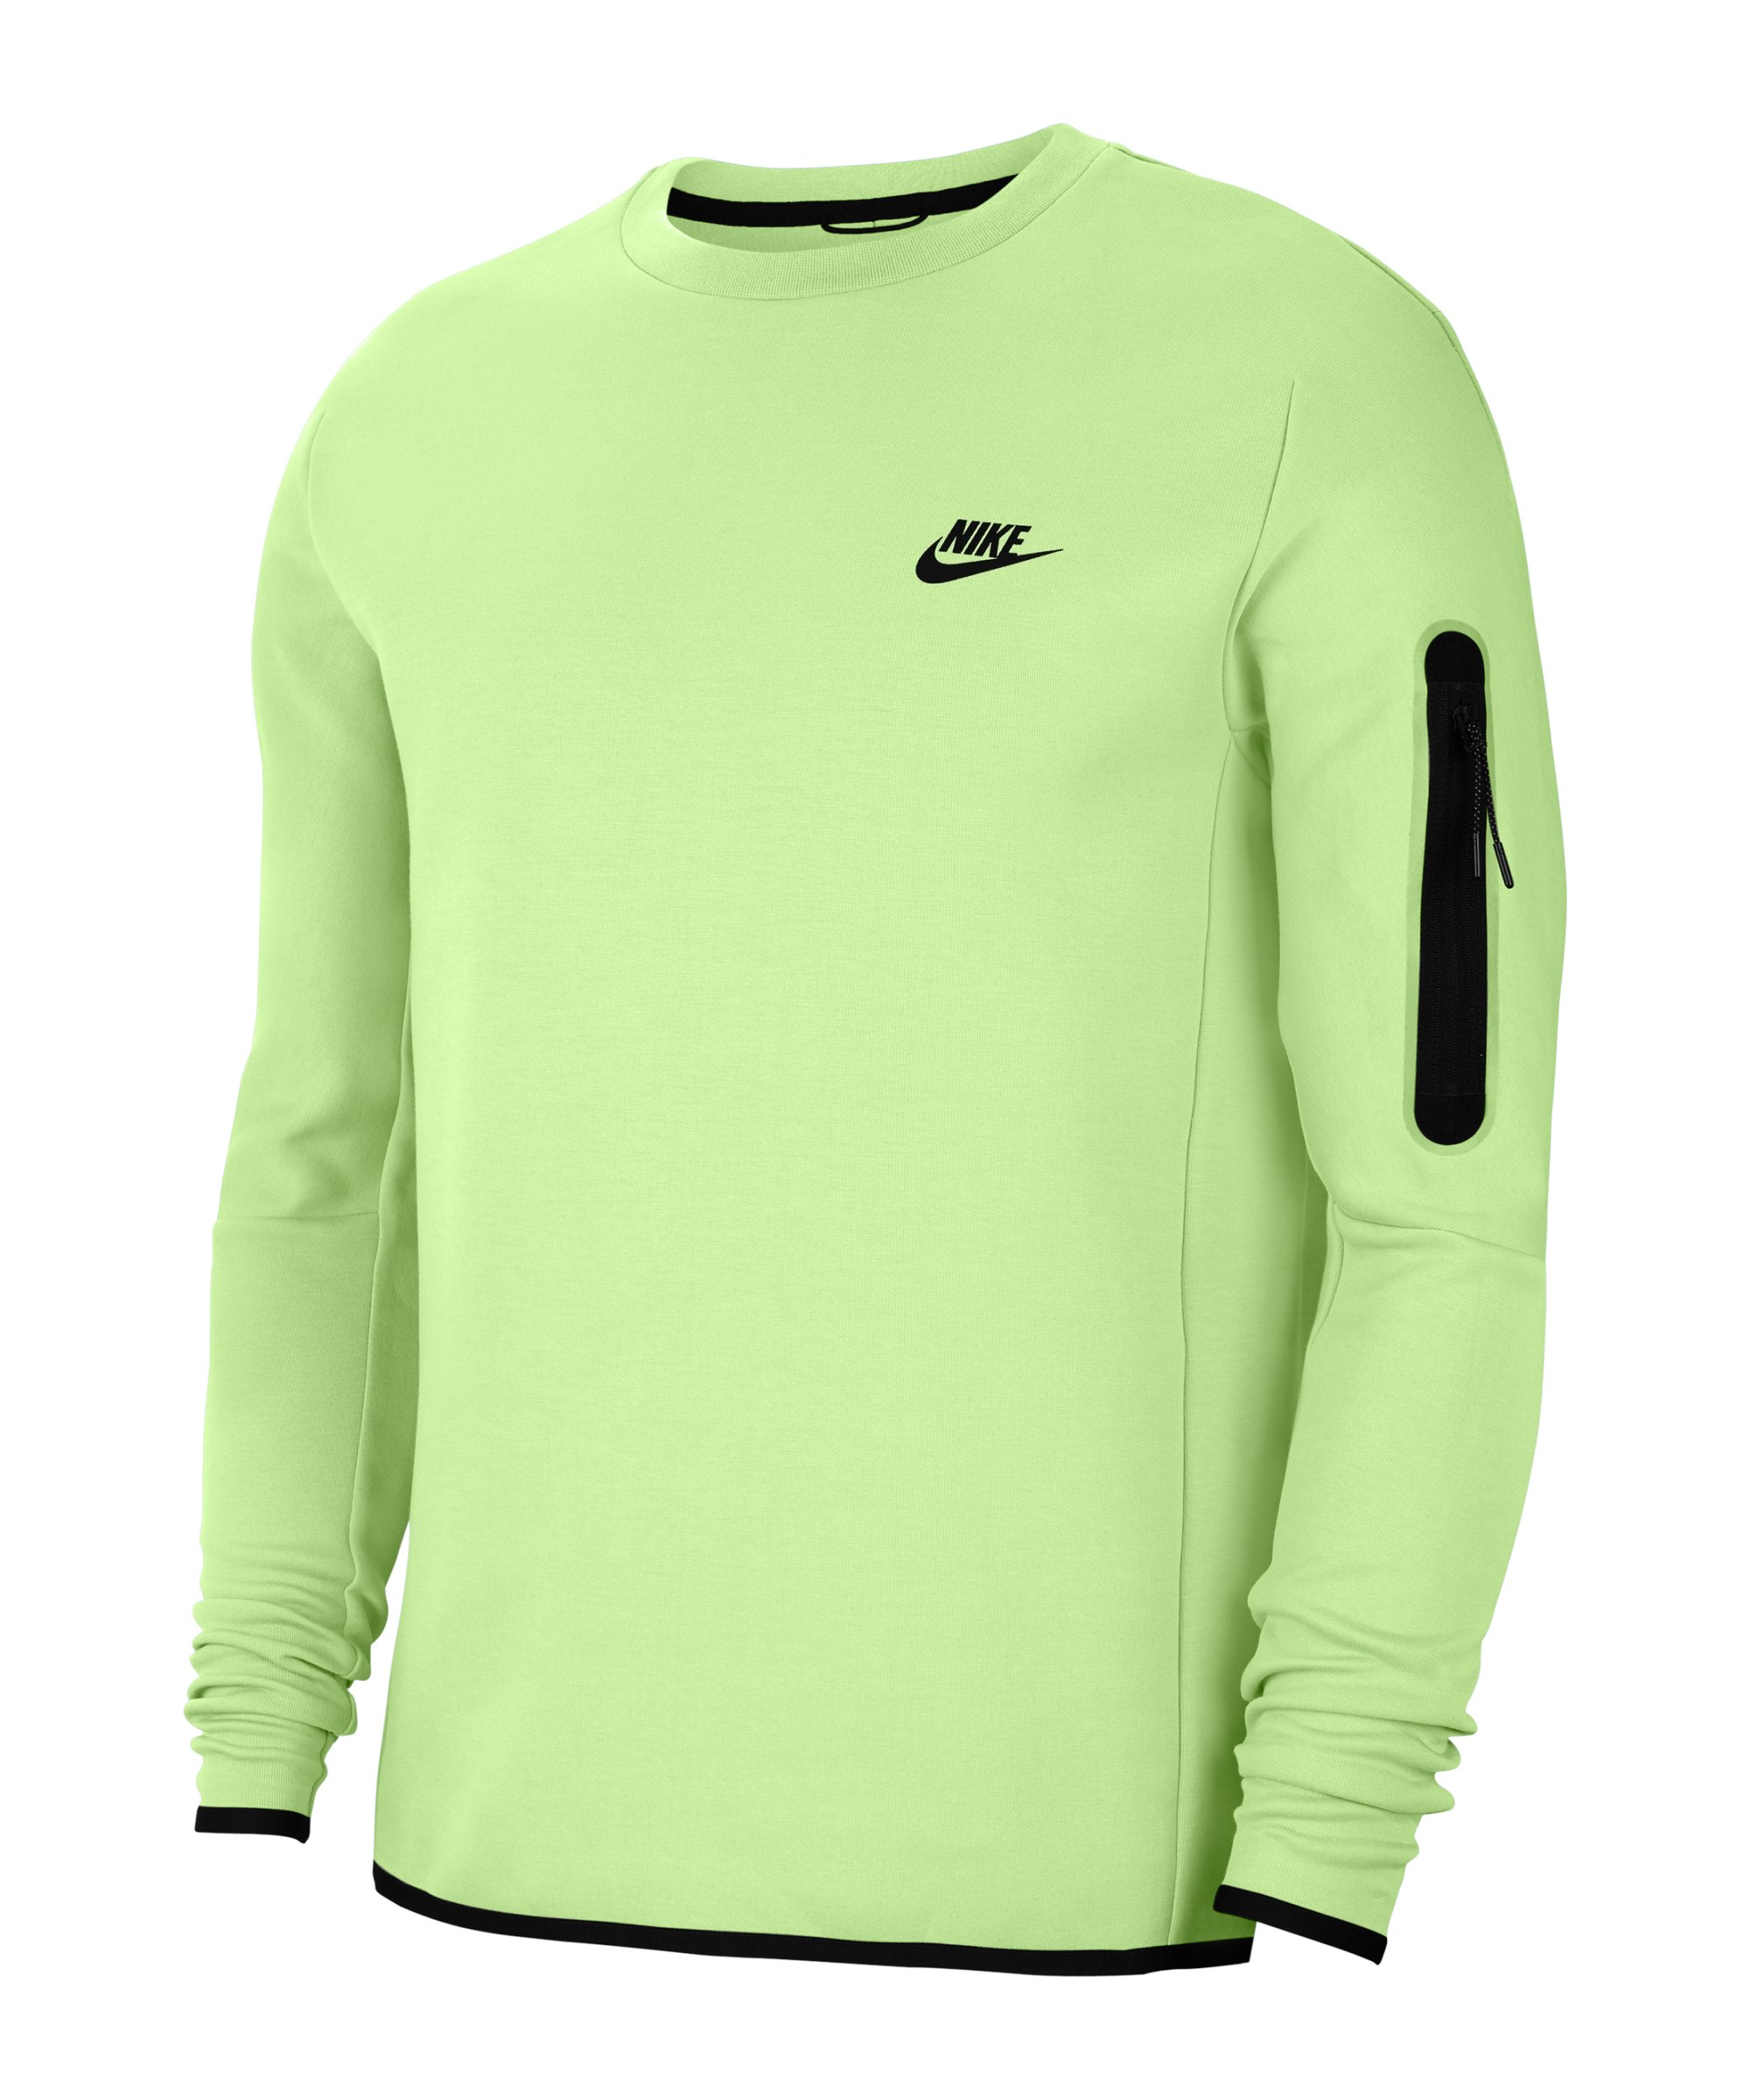 Nike Tech Fleece Crew Sweatshirt Grün Schwarz F383 - gruen